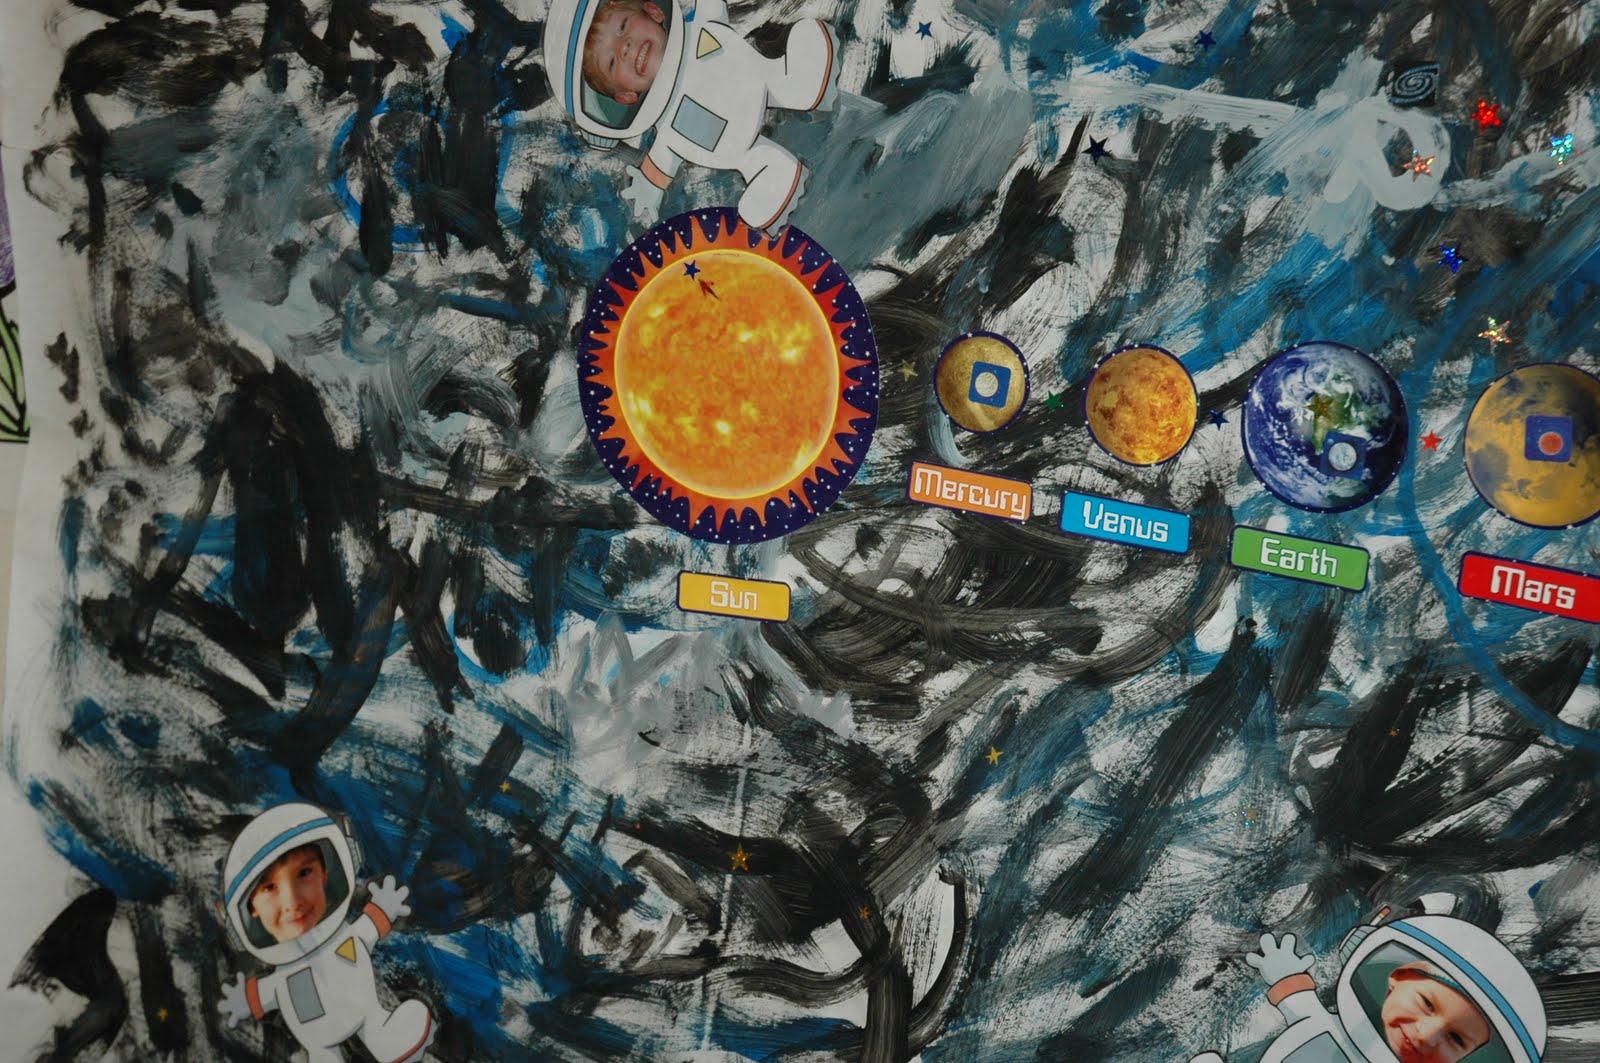 astronaut mural-#34